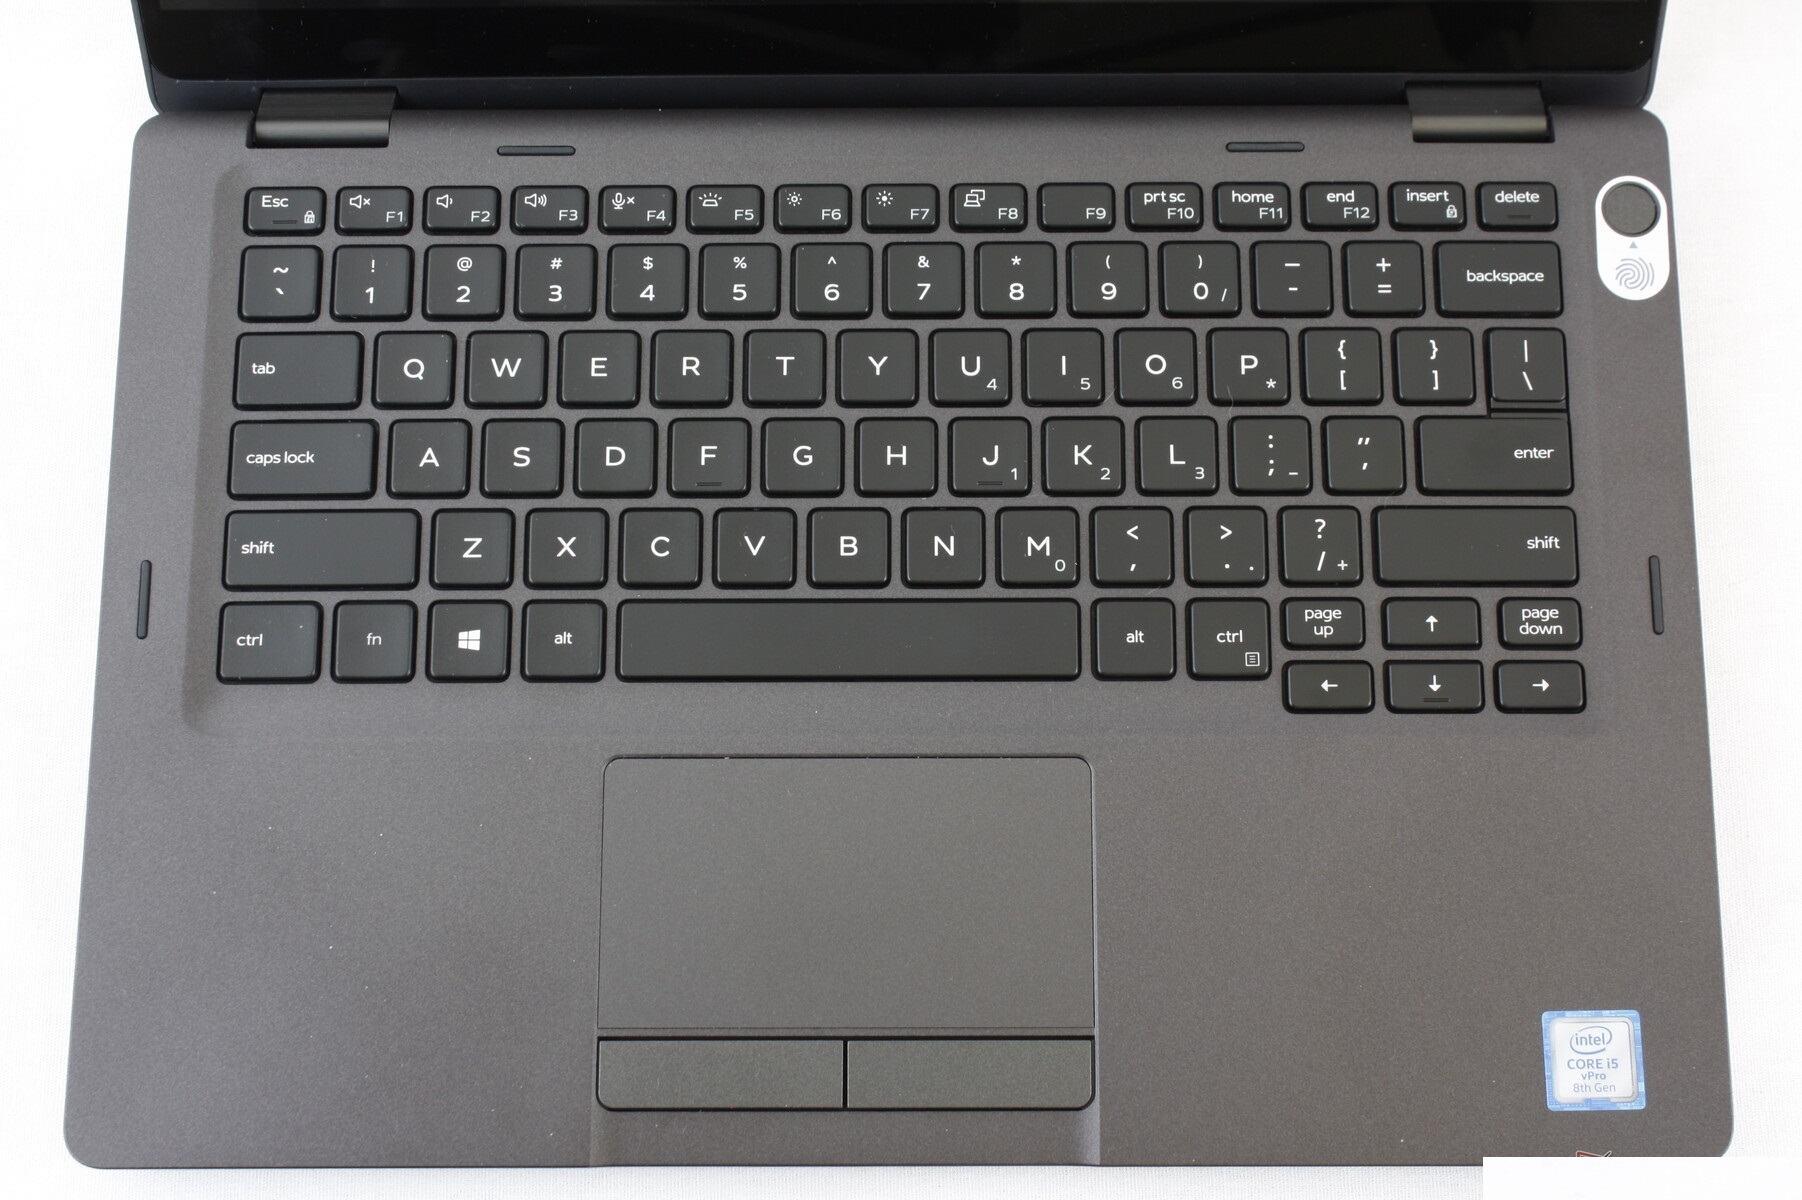 đánh giá laptop Dell Latitude 13 5300 2 in 1